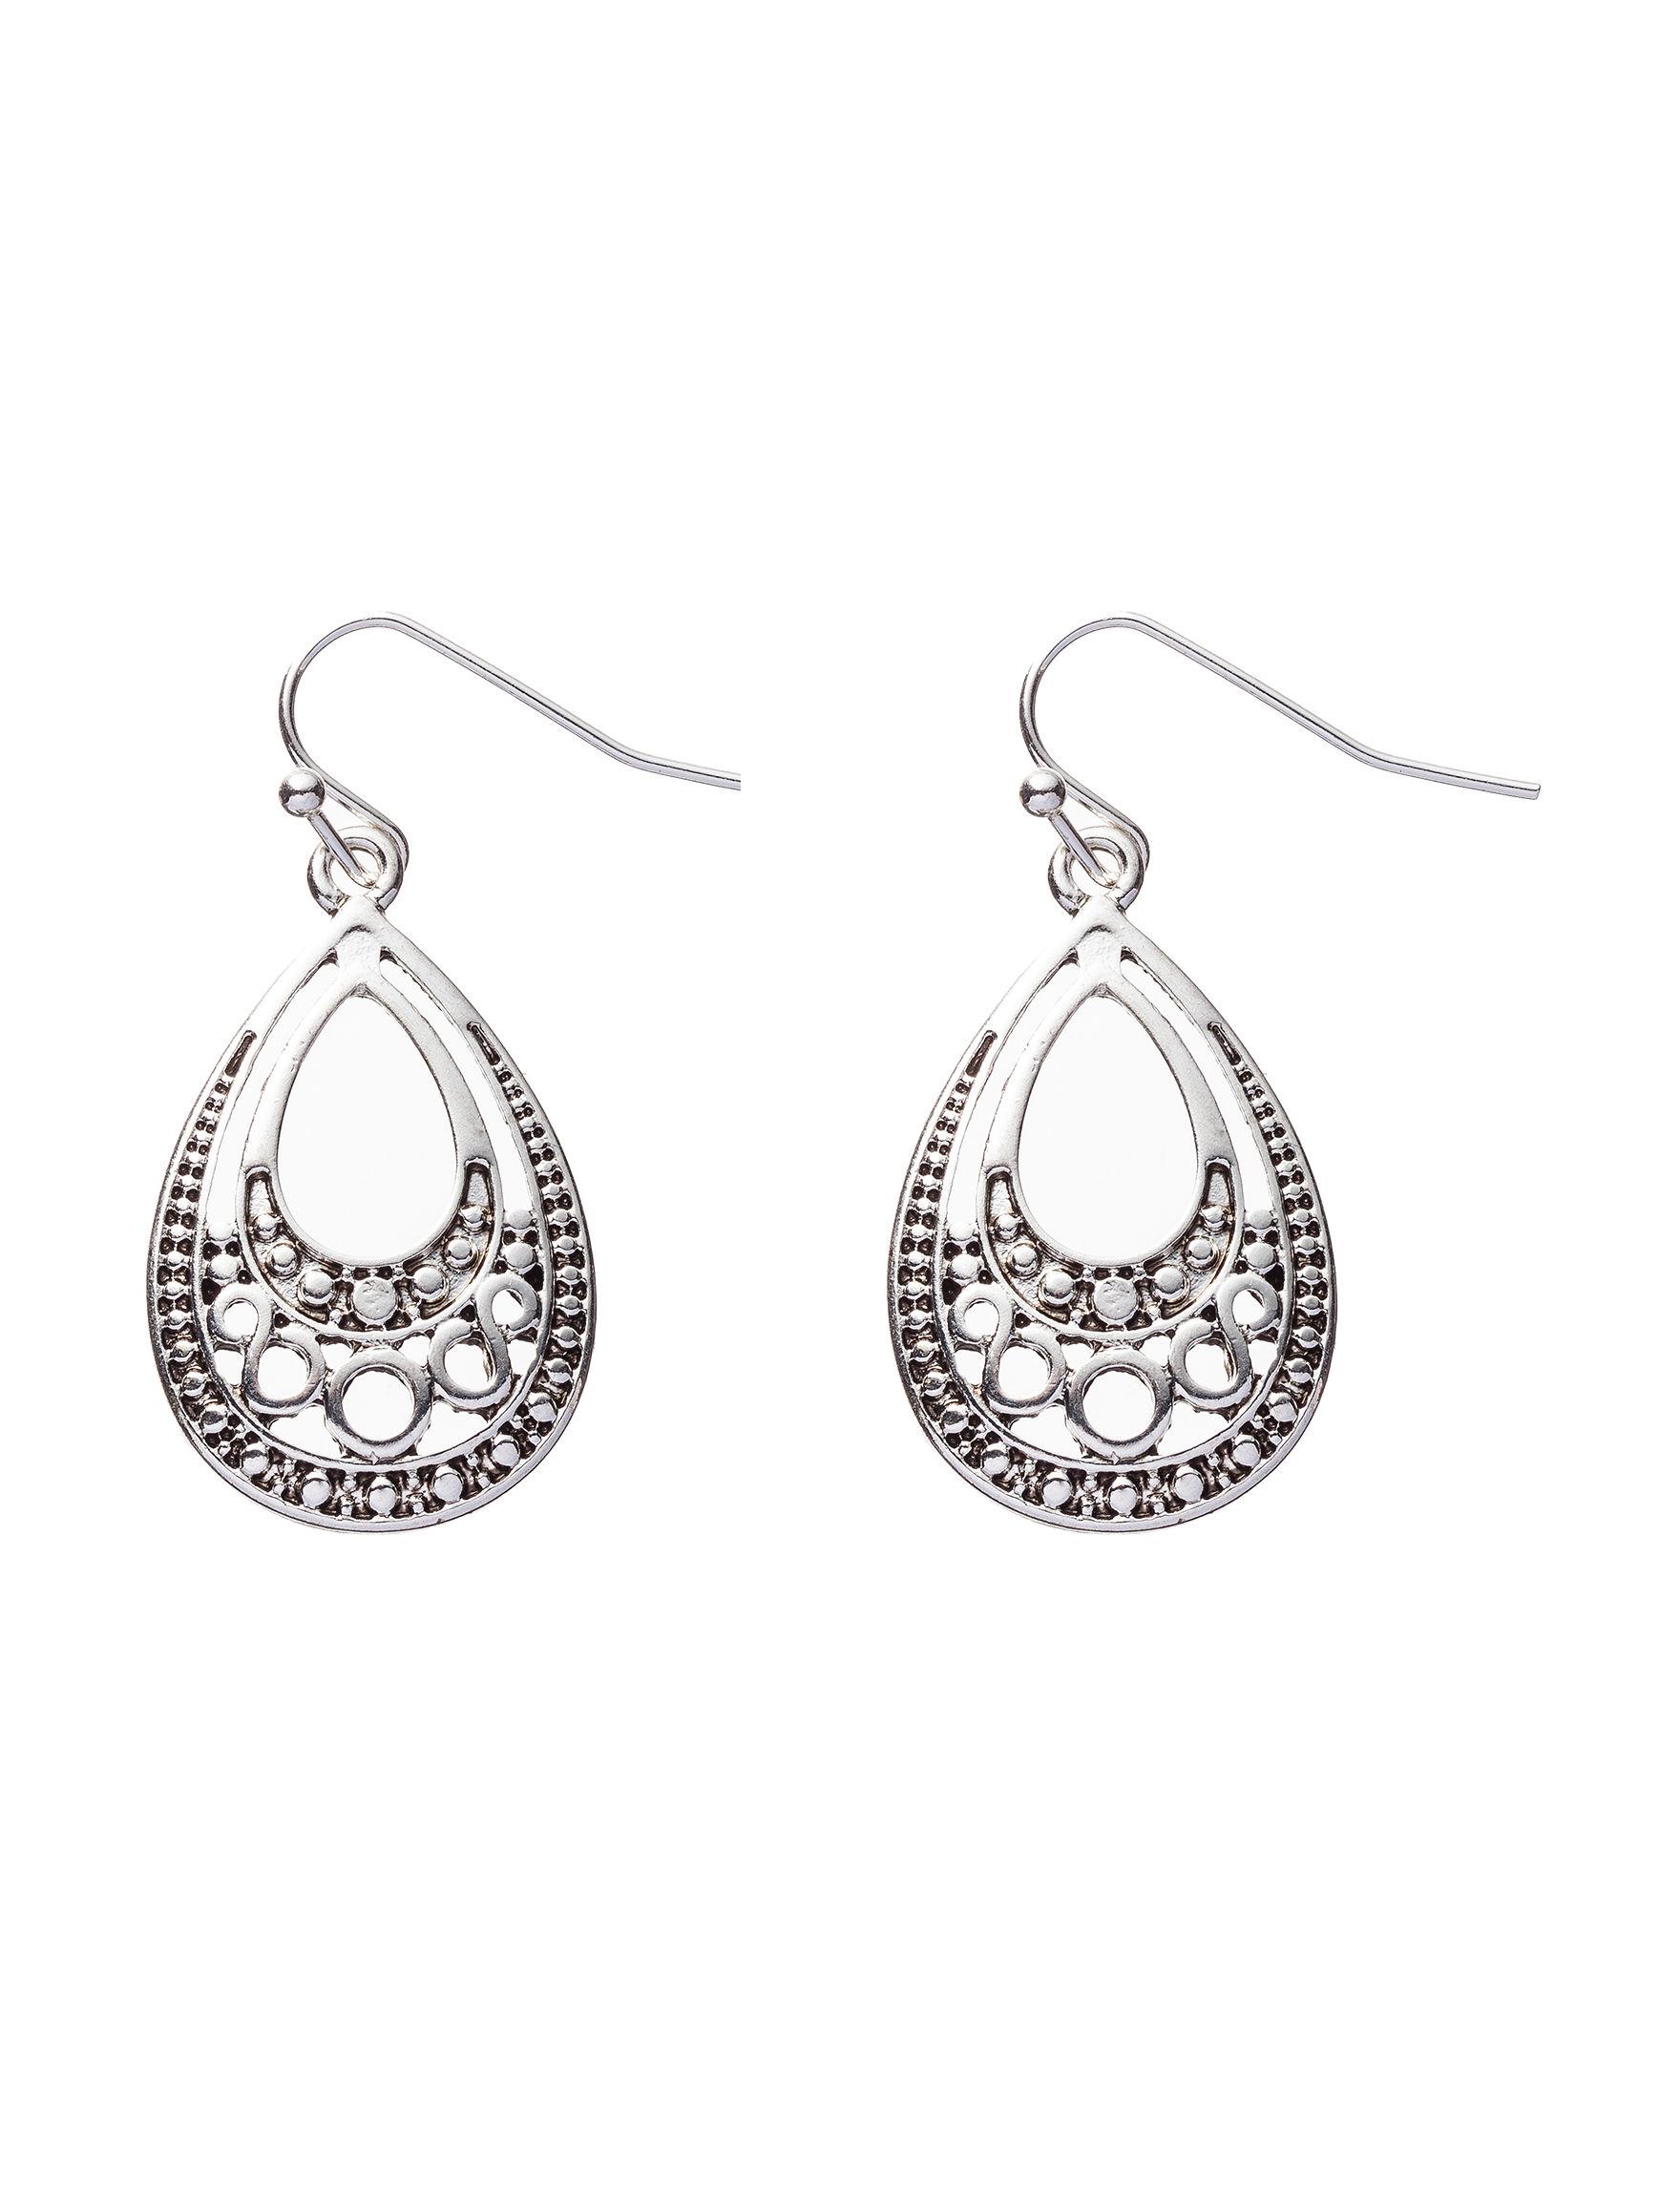 Hannah Antique Silver Hoops Earrings Fashion Jewelry